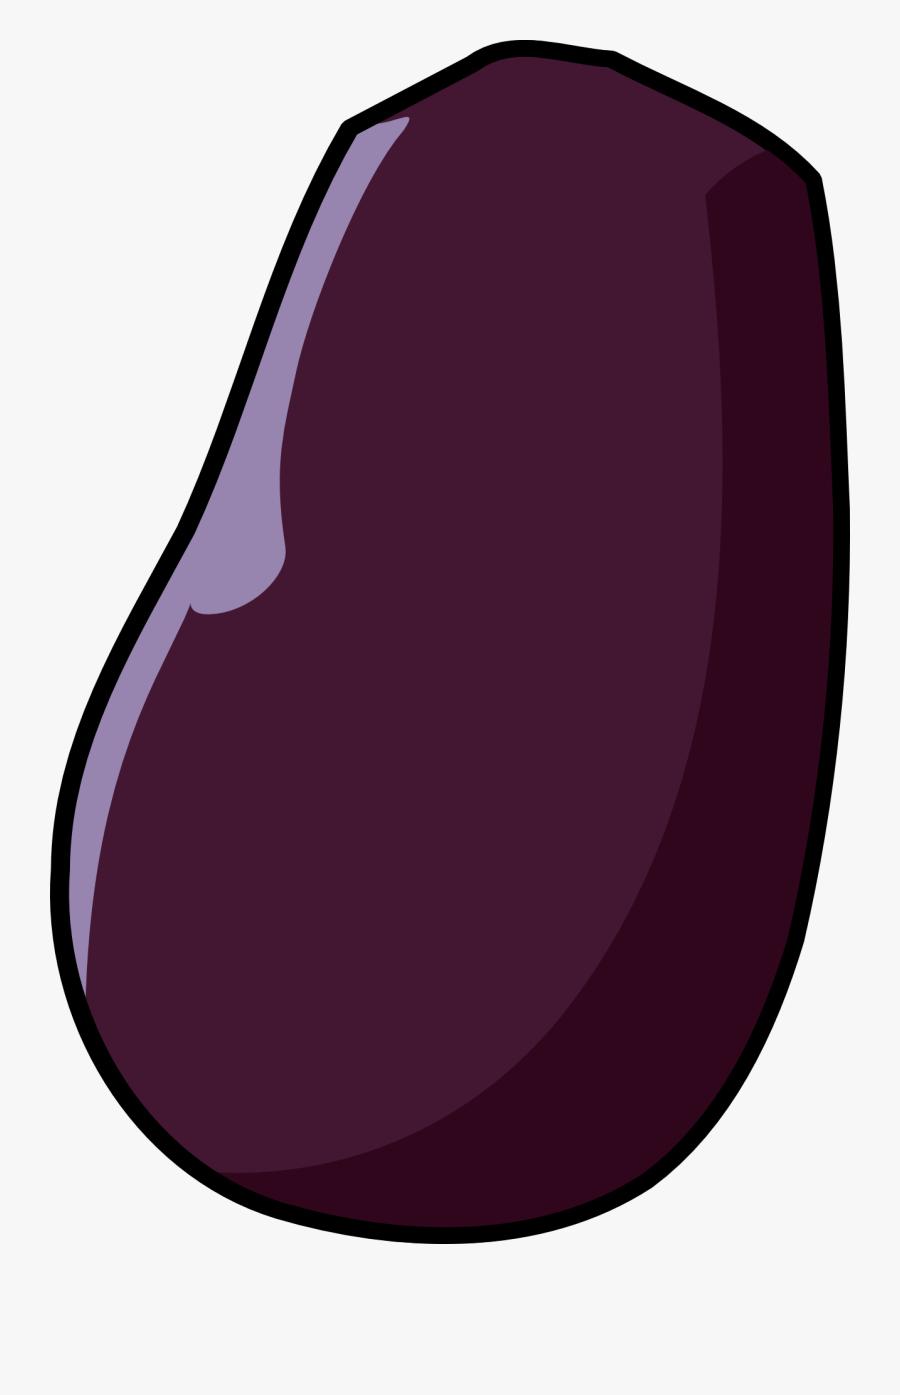 Eggplant, Transparent Clipart